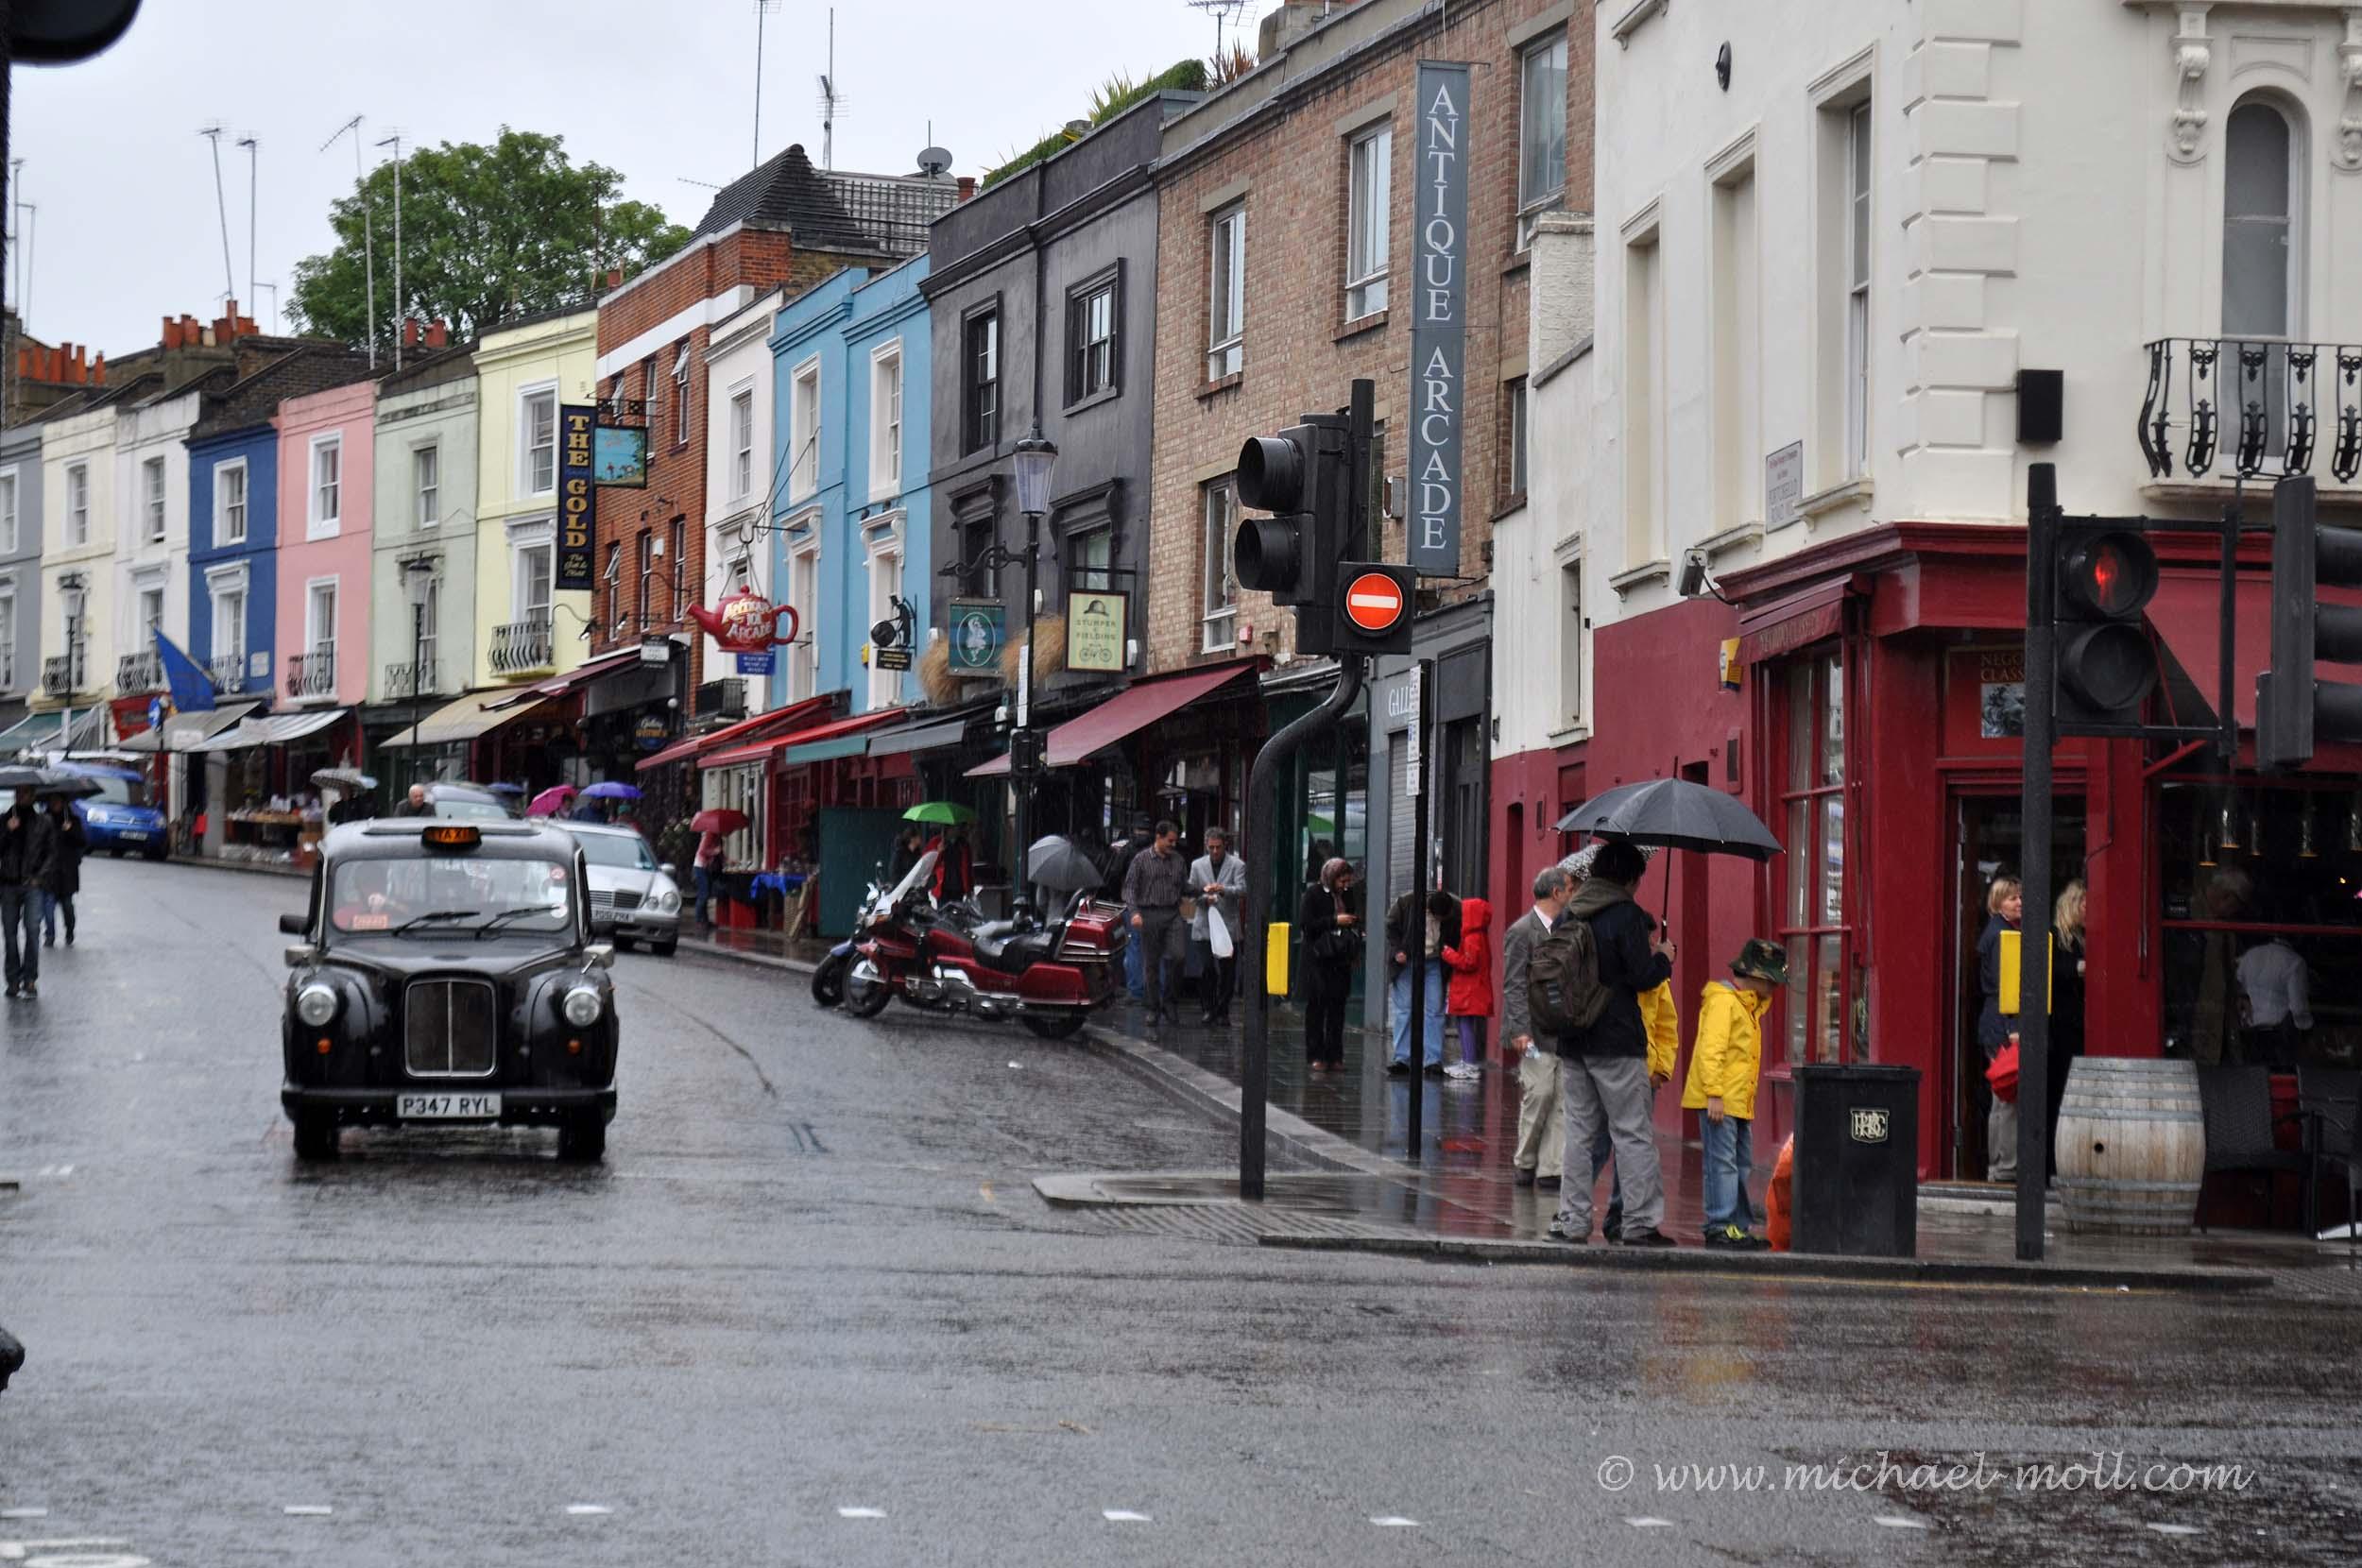 Straße in Notting Hill